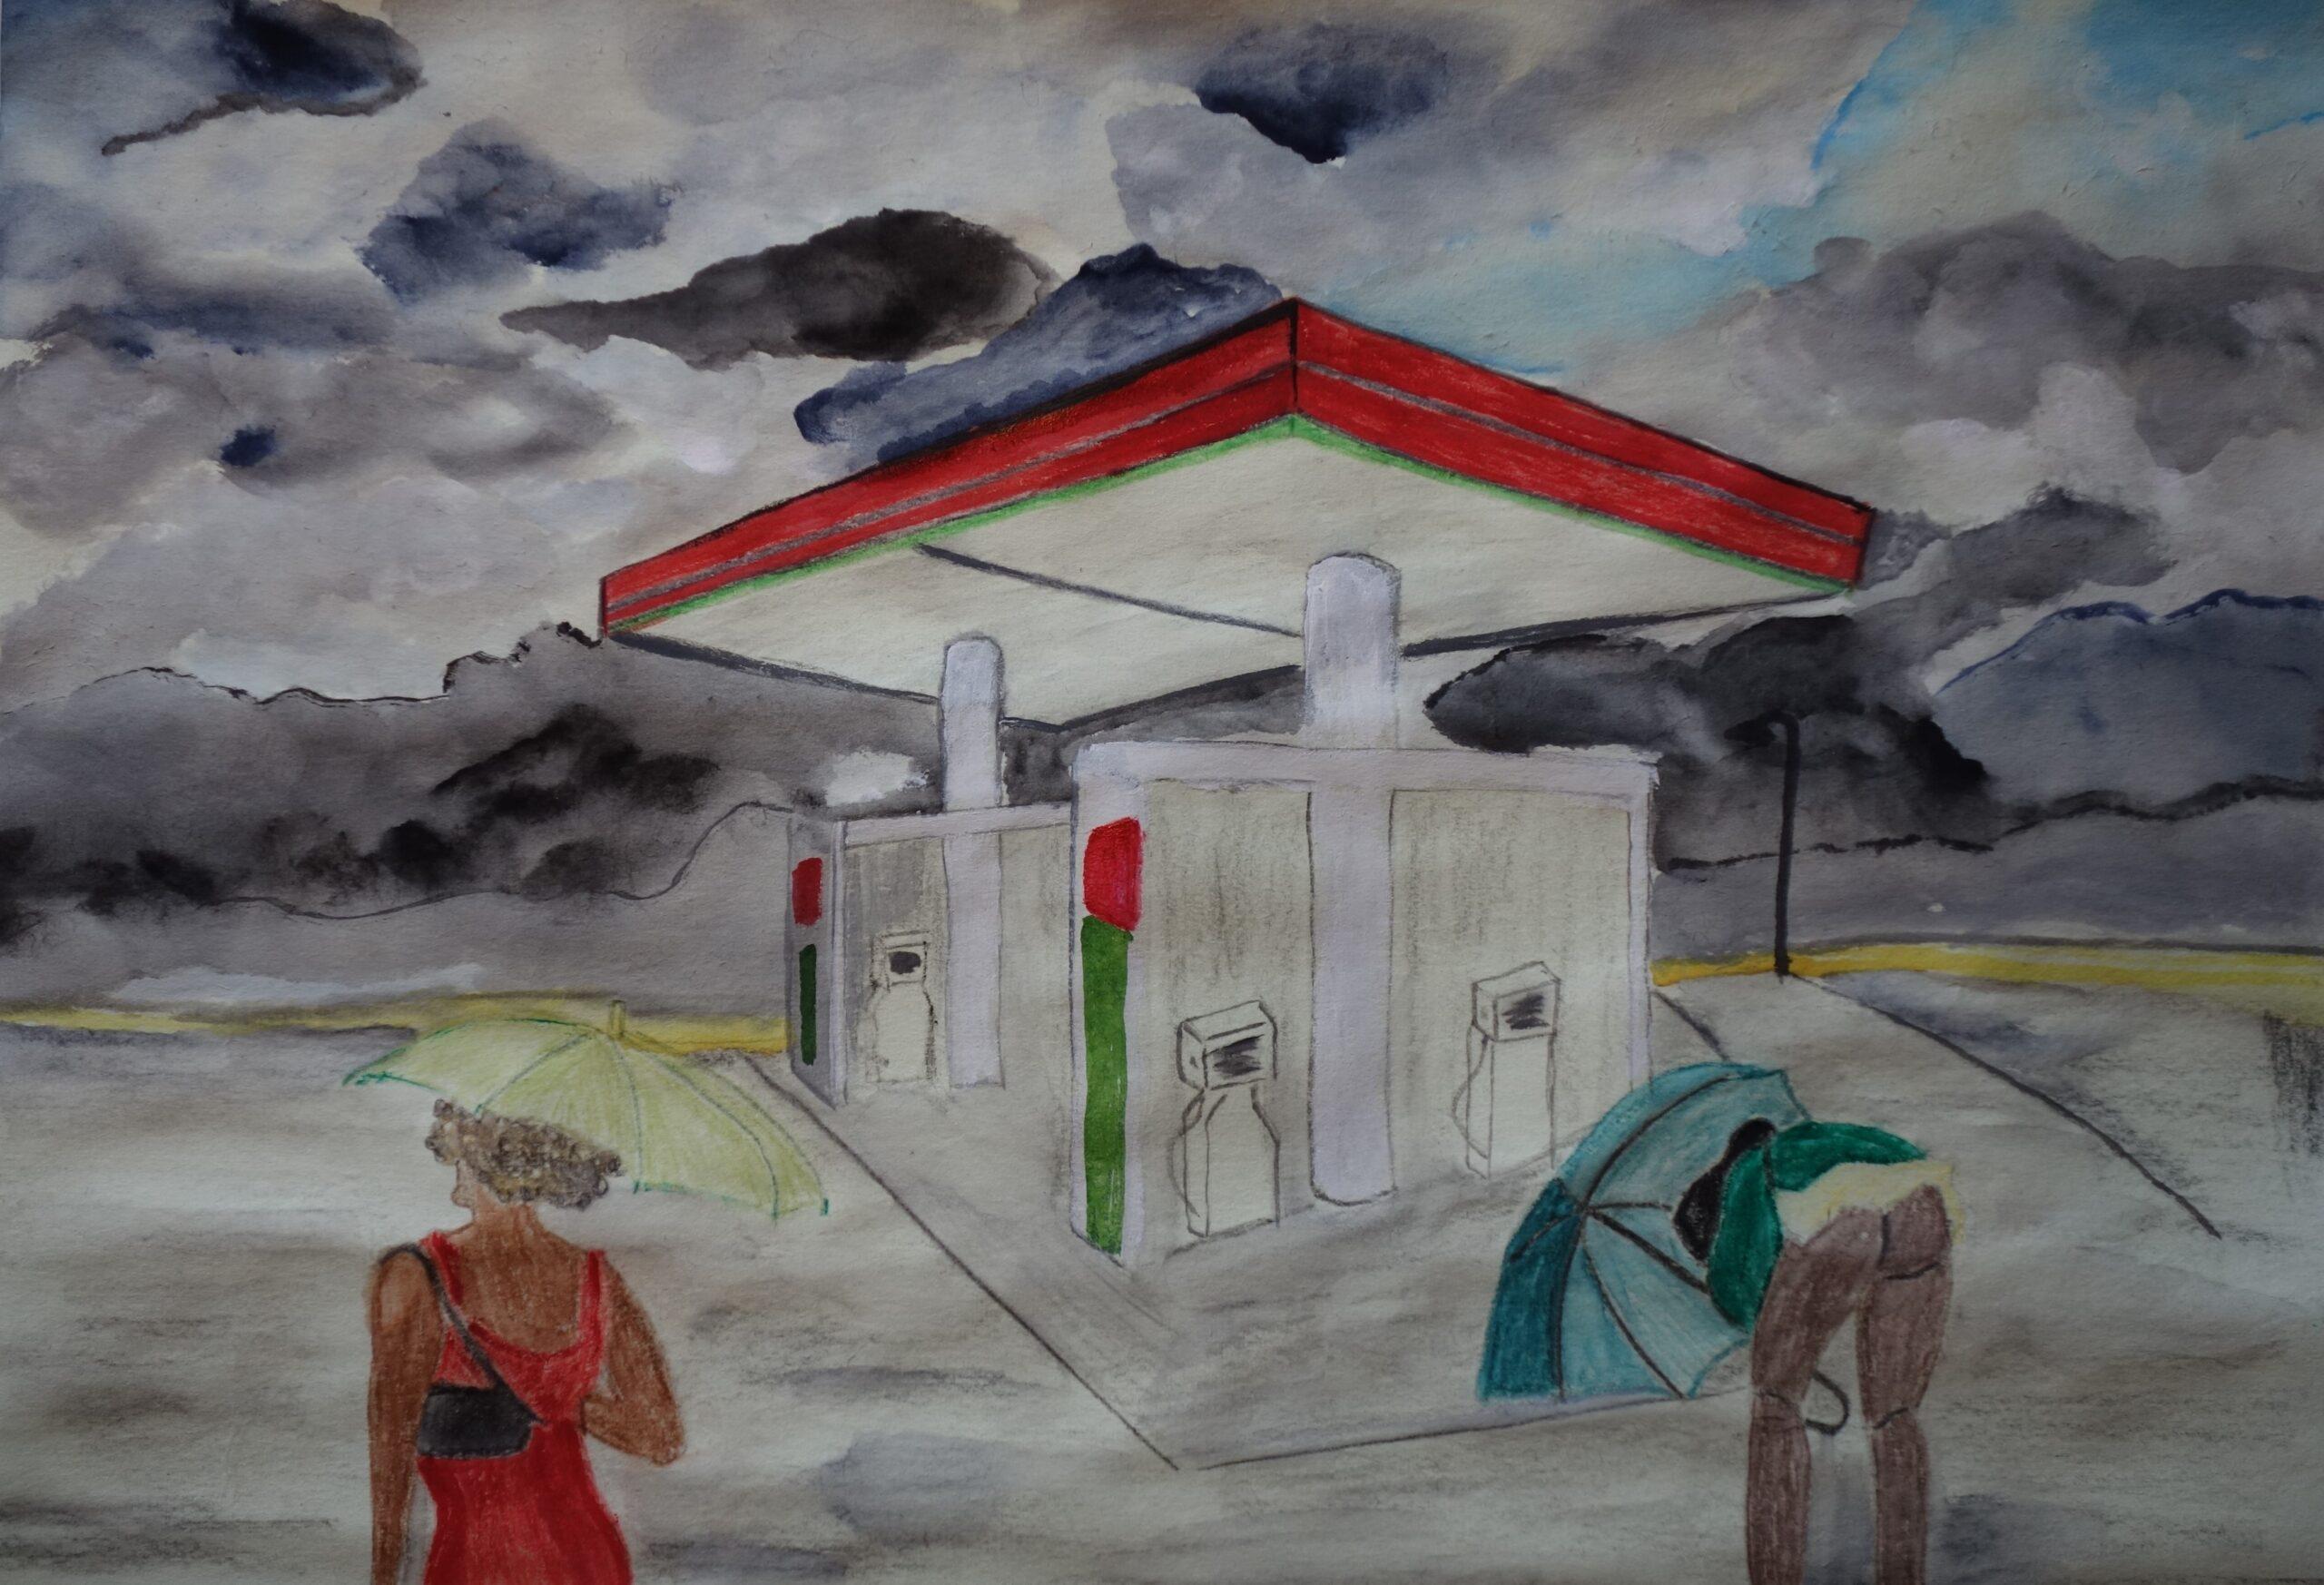 Olga & Olga 2021 - acquerello su carta di riso 31x44 cm